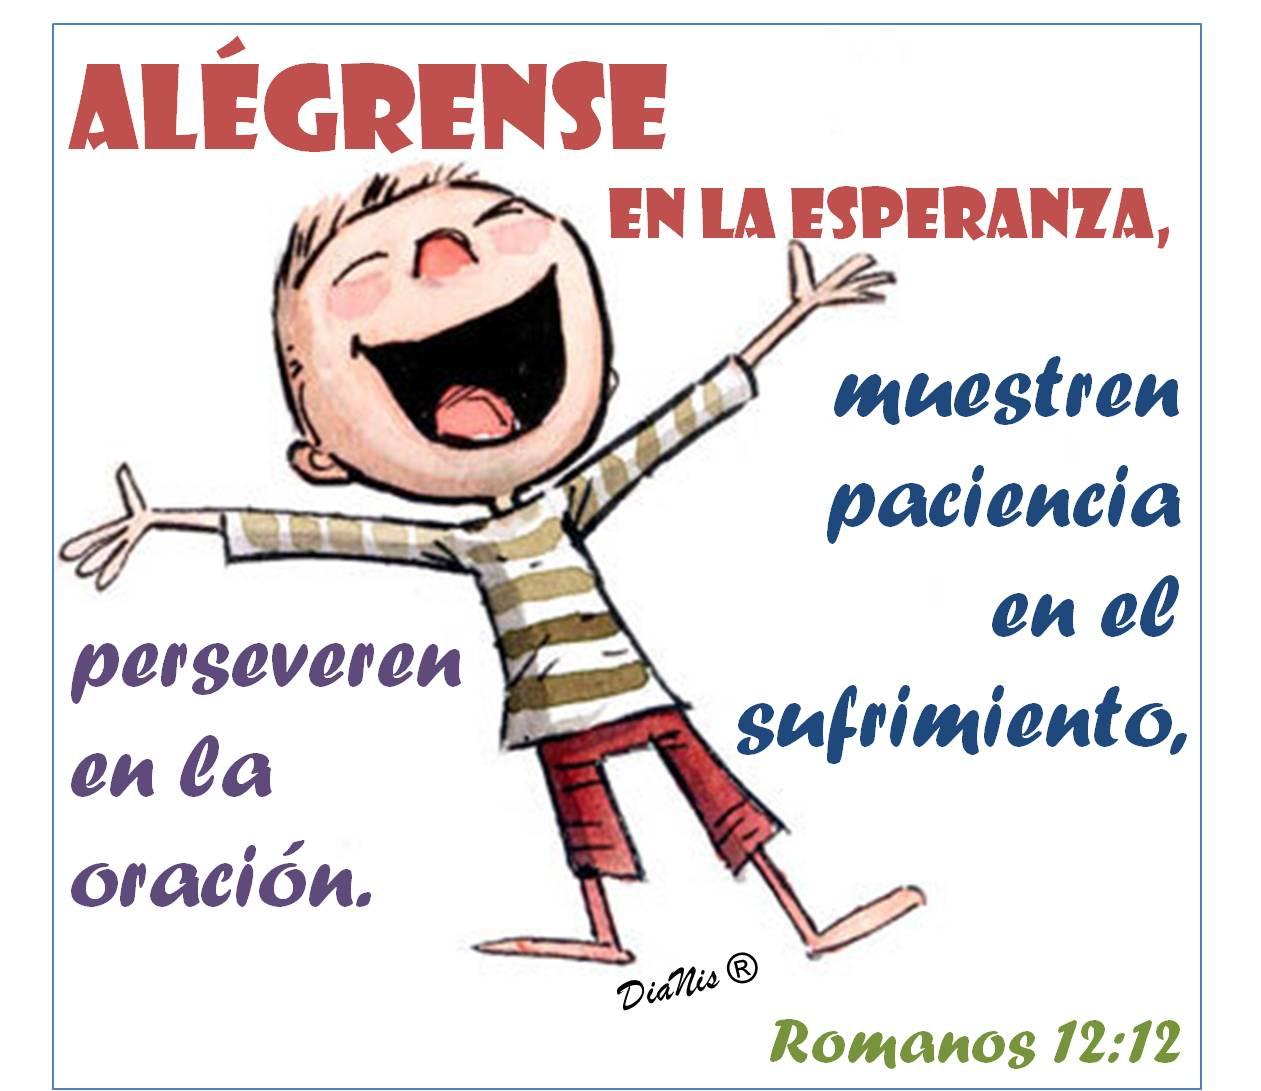 Romanos 12